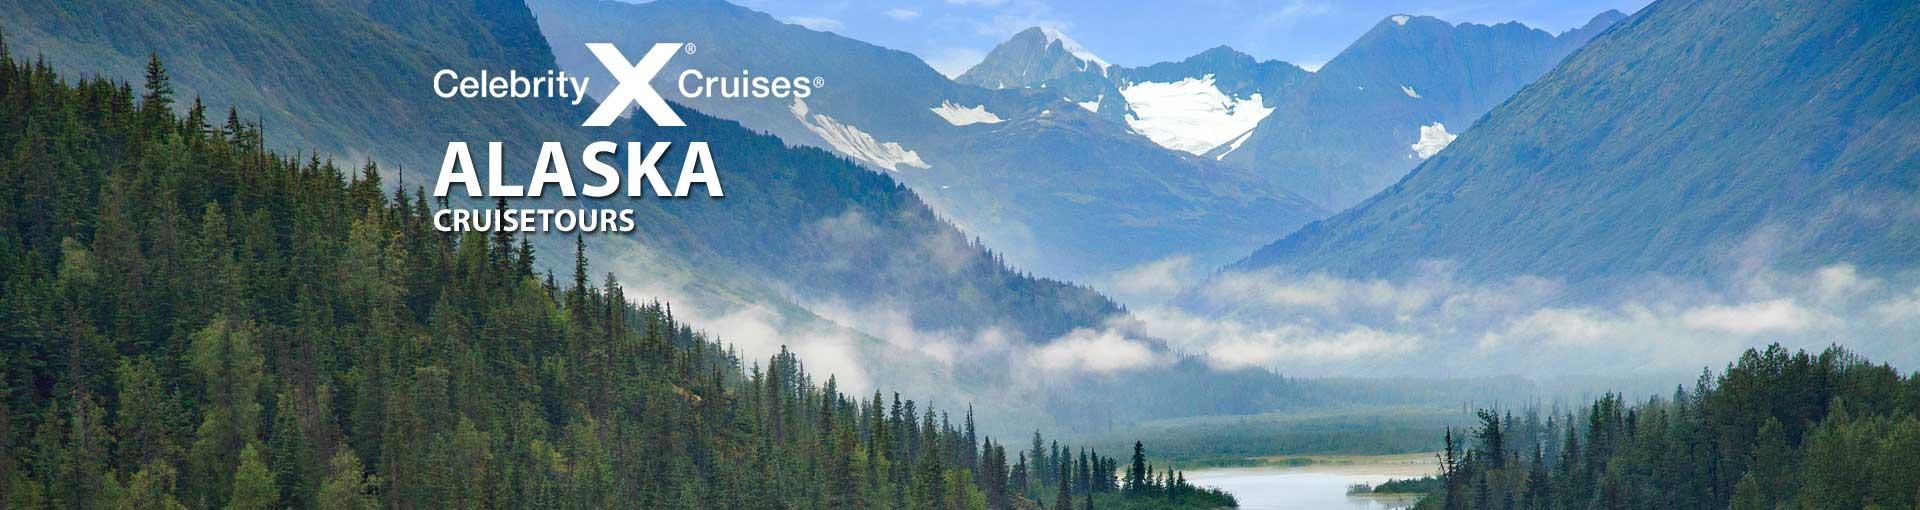 Celebrity Cruises Announces 2019-20 Alaska and Pacific ...